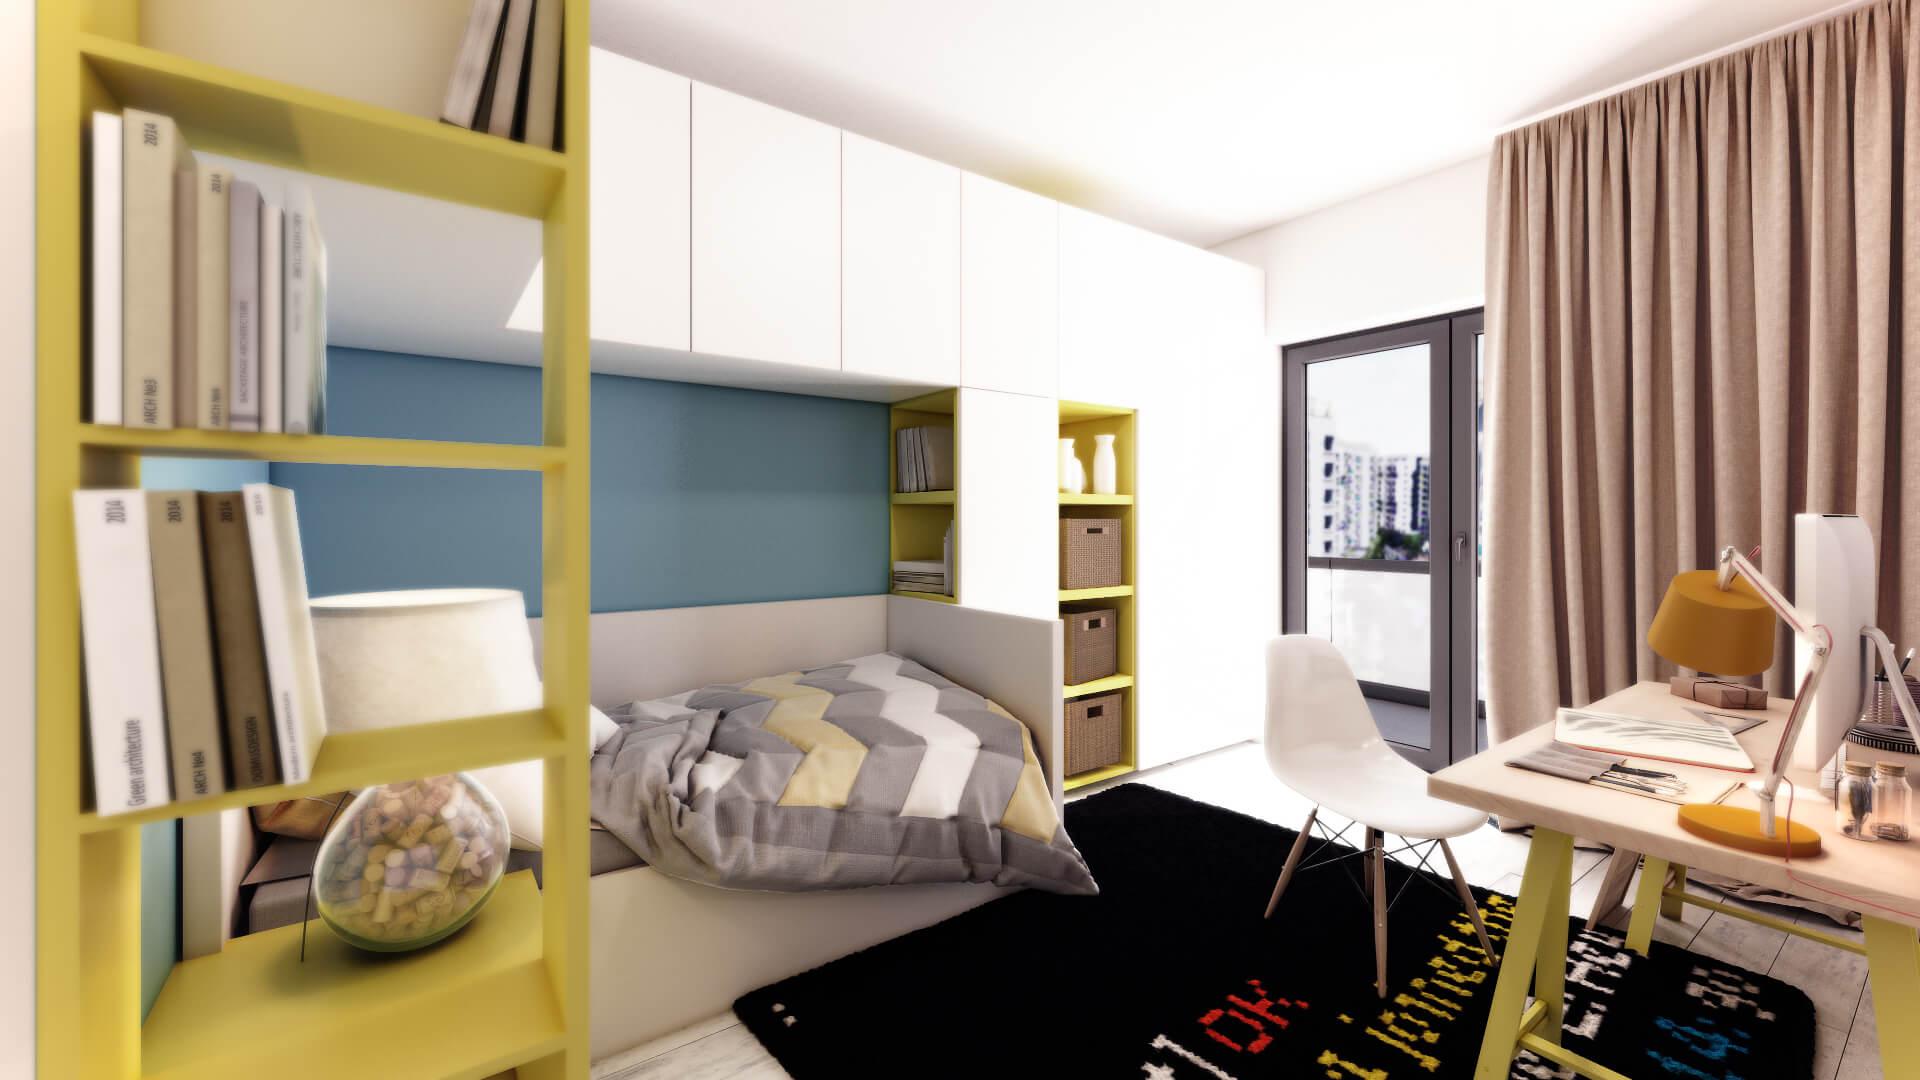 Dormitor_001